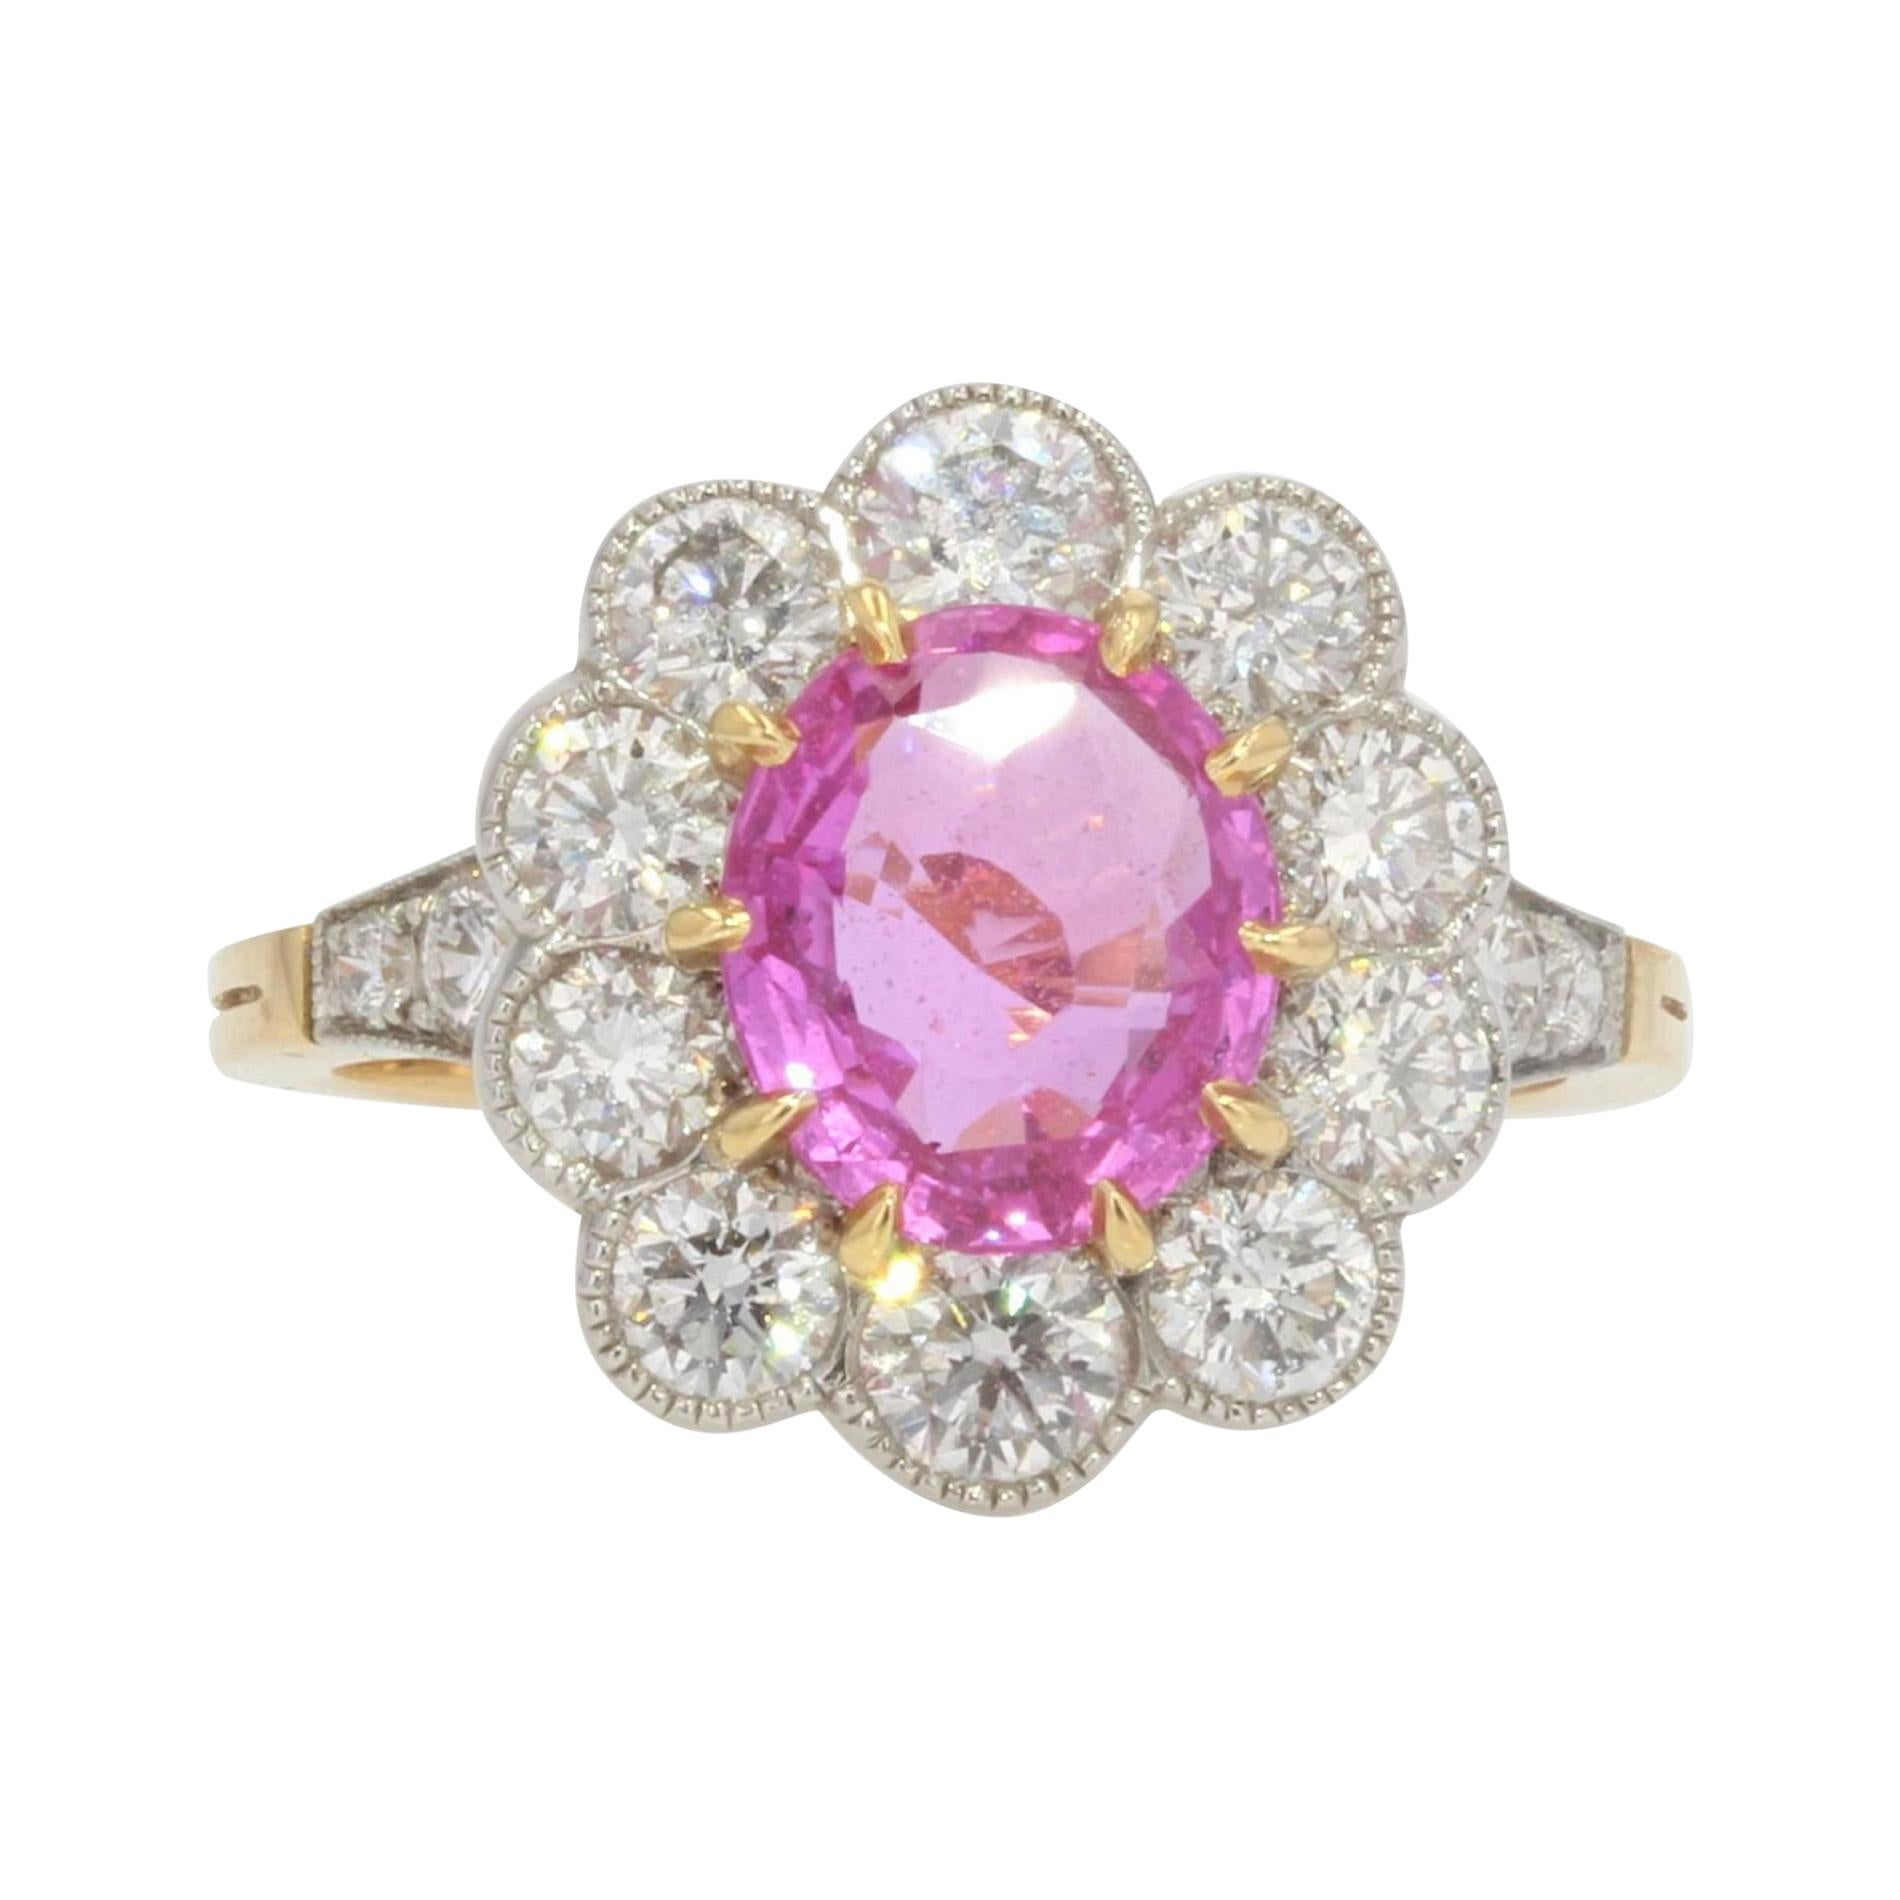 French Pink Sapphire Diamonds 18 Karat Yellow Gold Platinum Daisy Ring